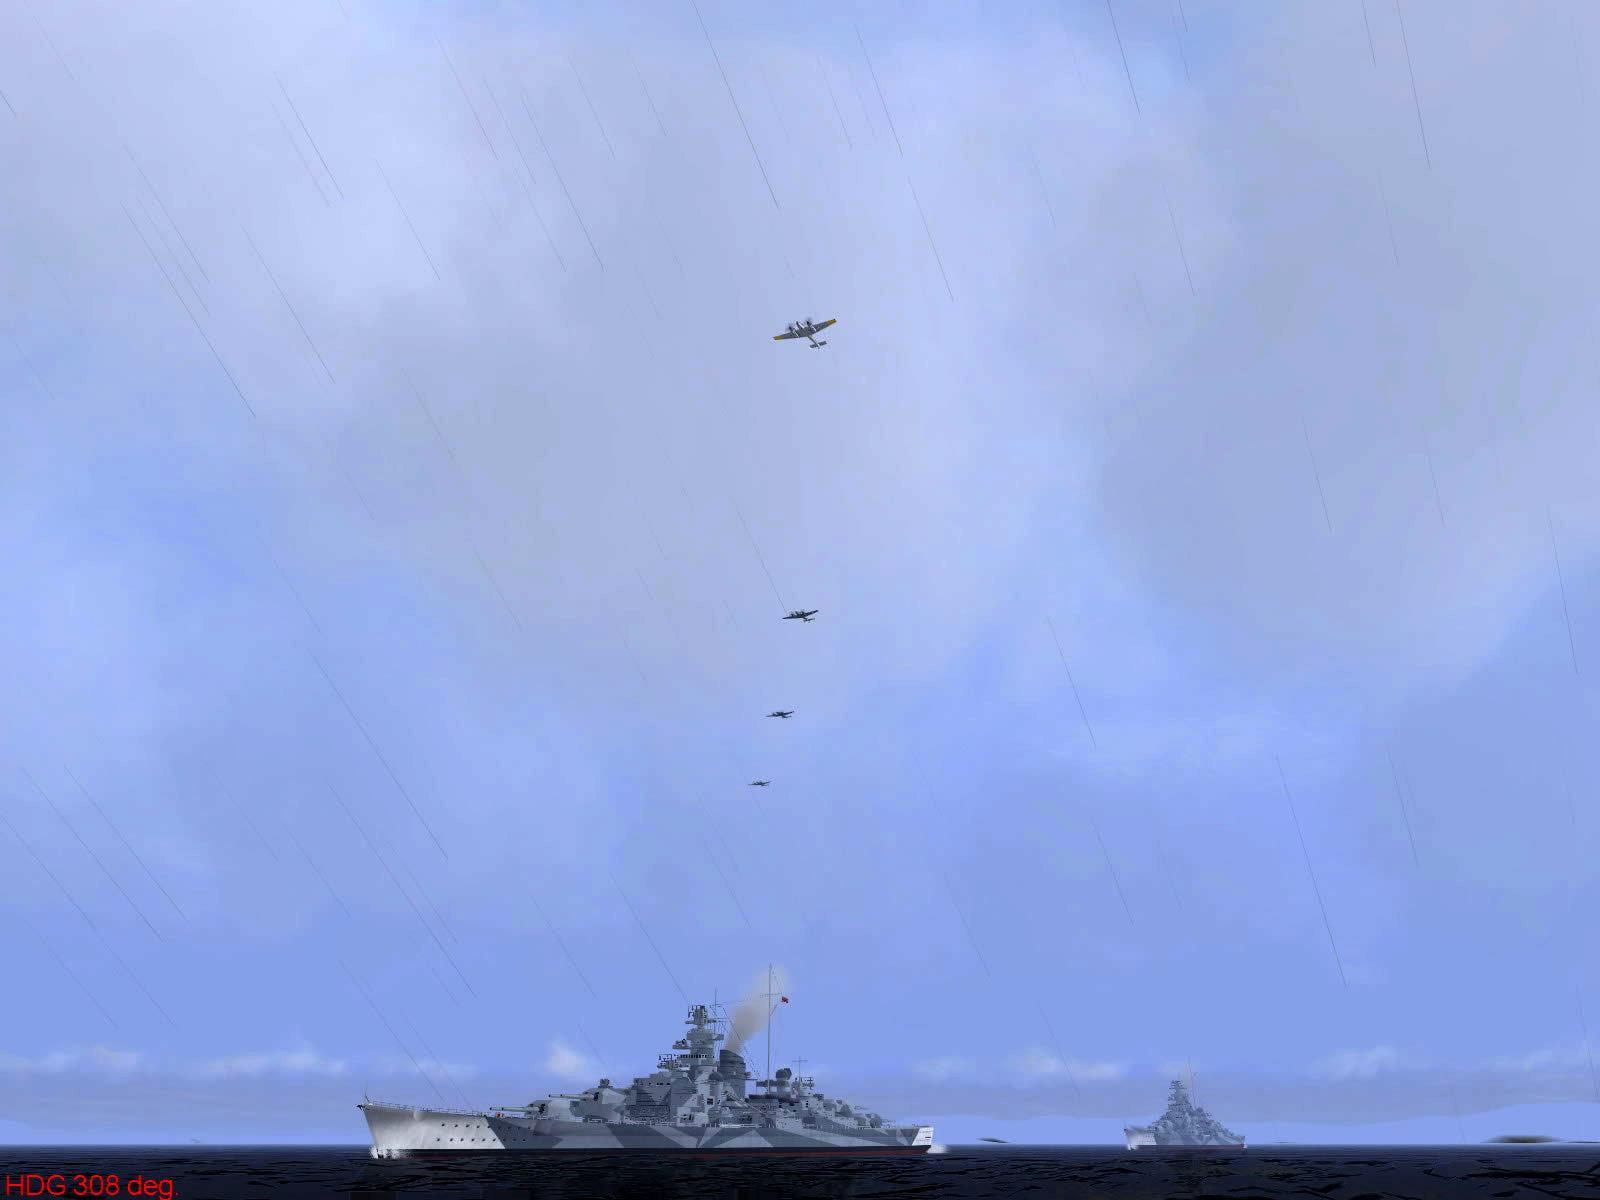 Ubisoft IL2 Sturmovik game version of Operation Donnerkeil 03